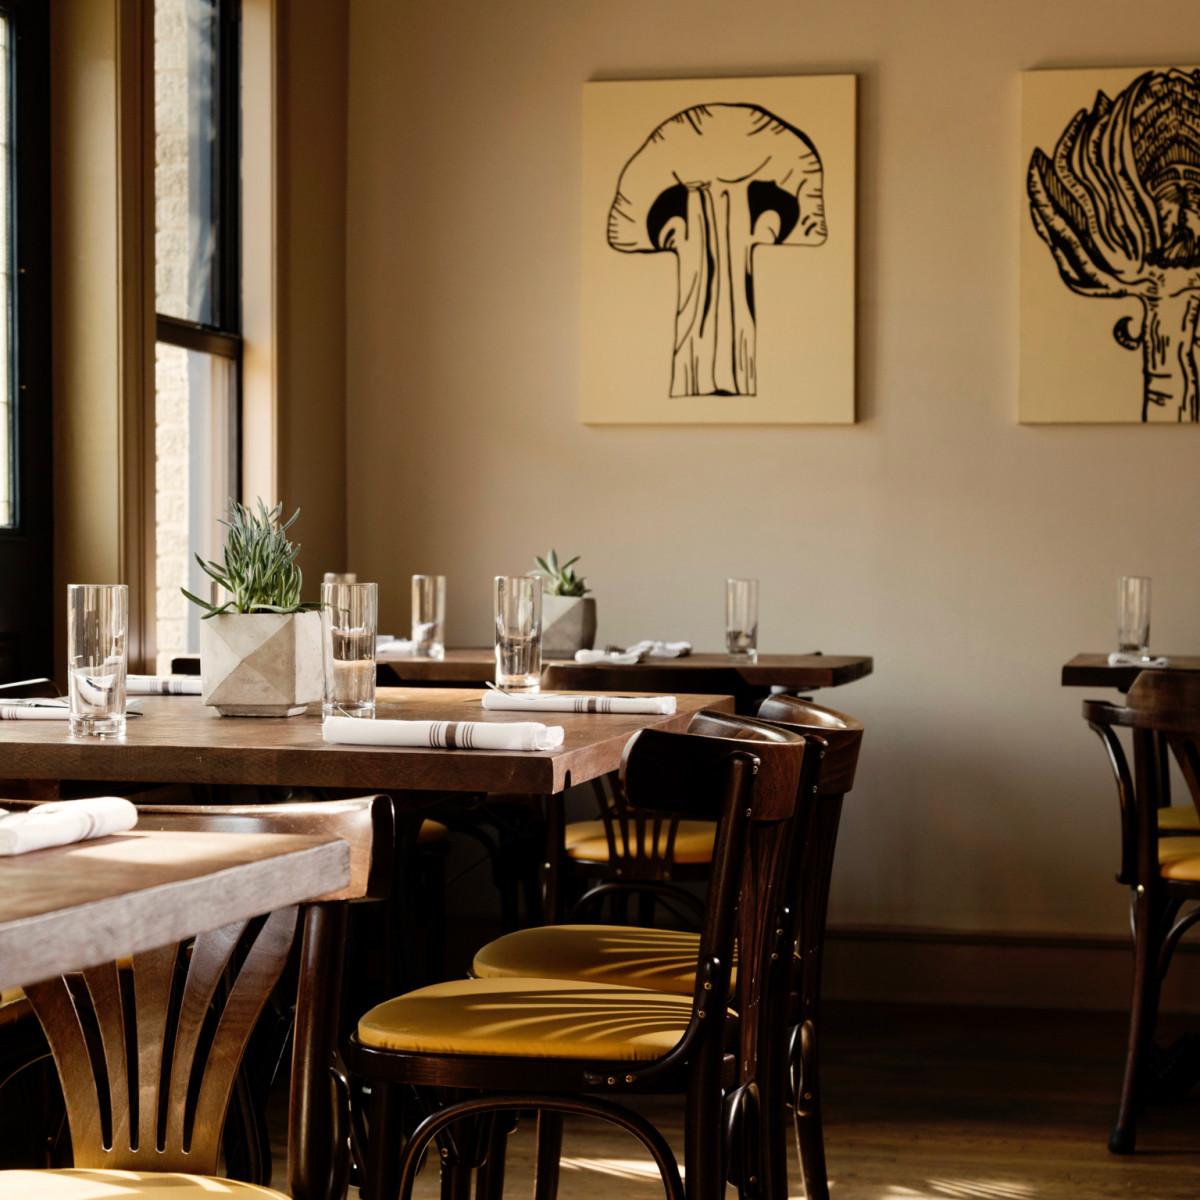 Nobie's dining room